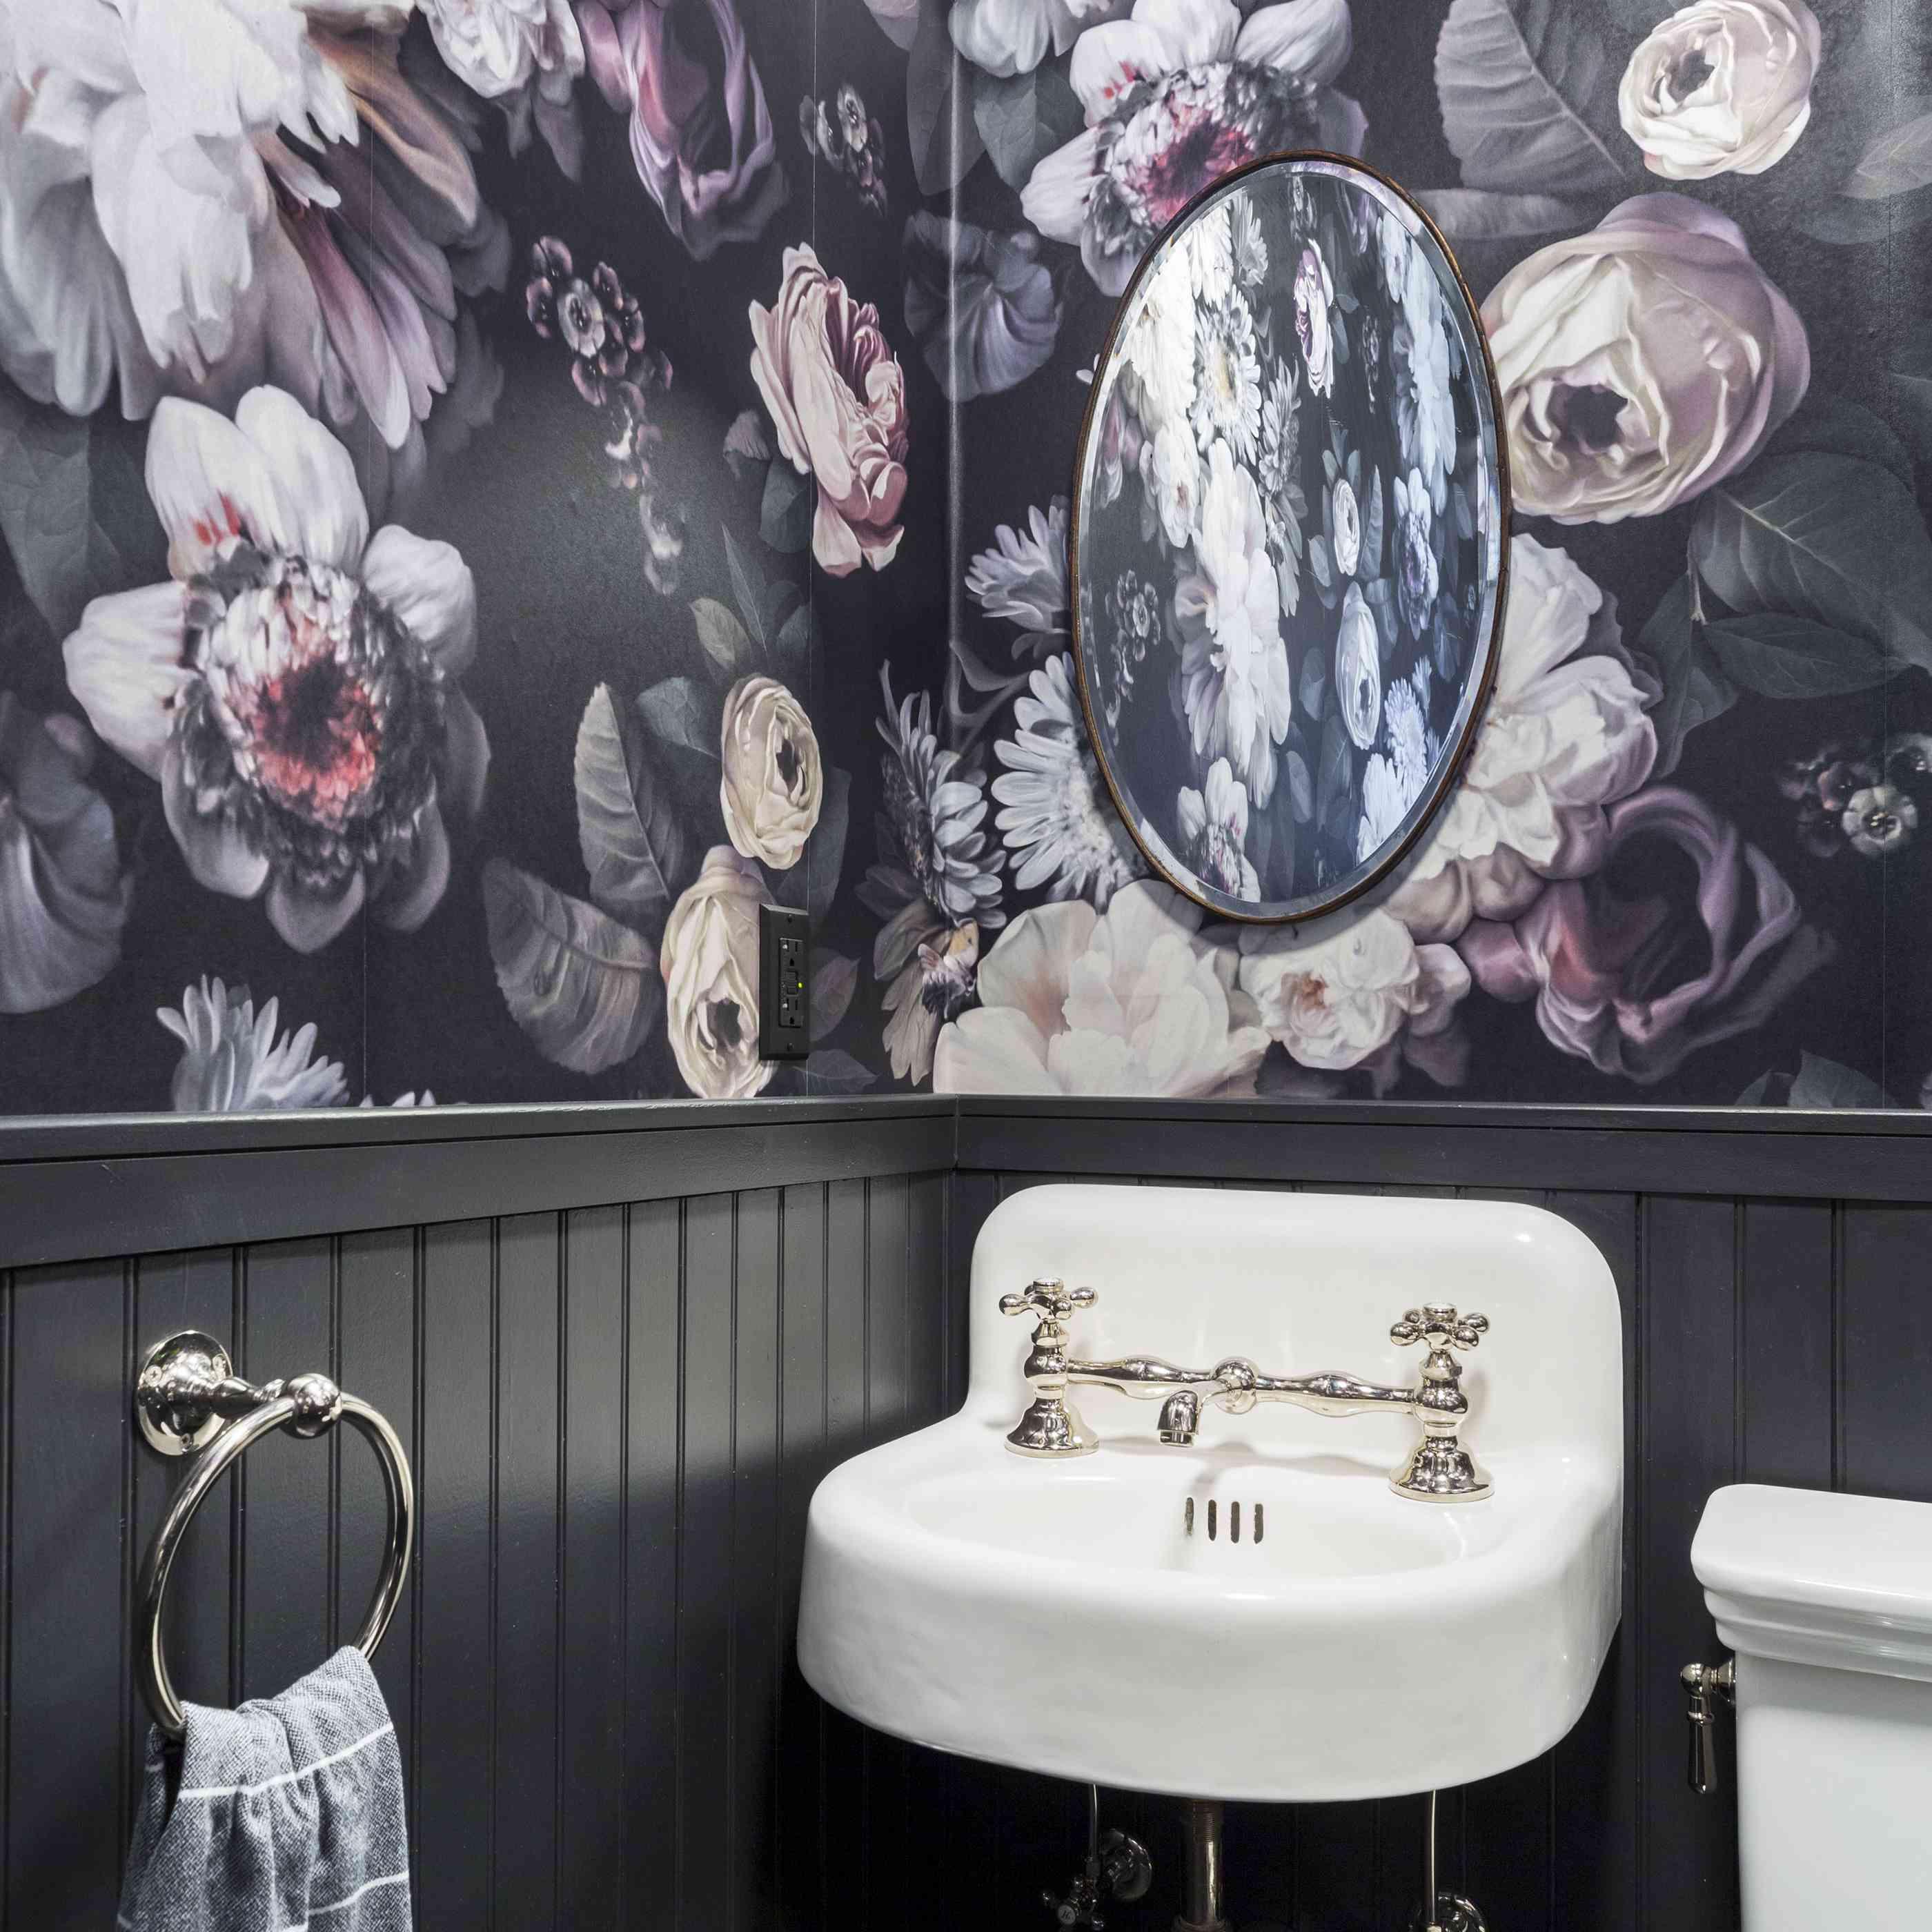 Black bathroom with floral wallpaper.